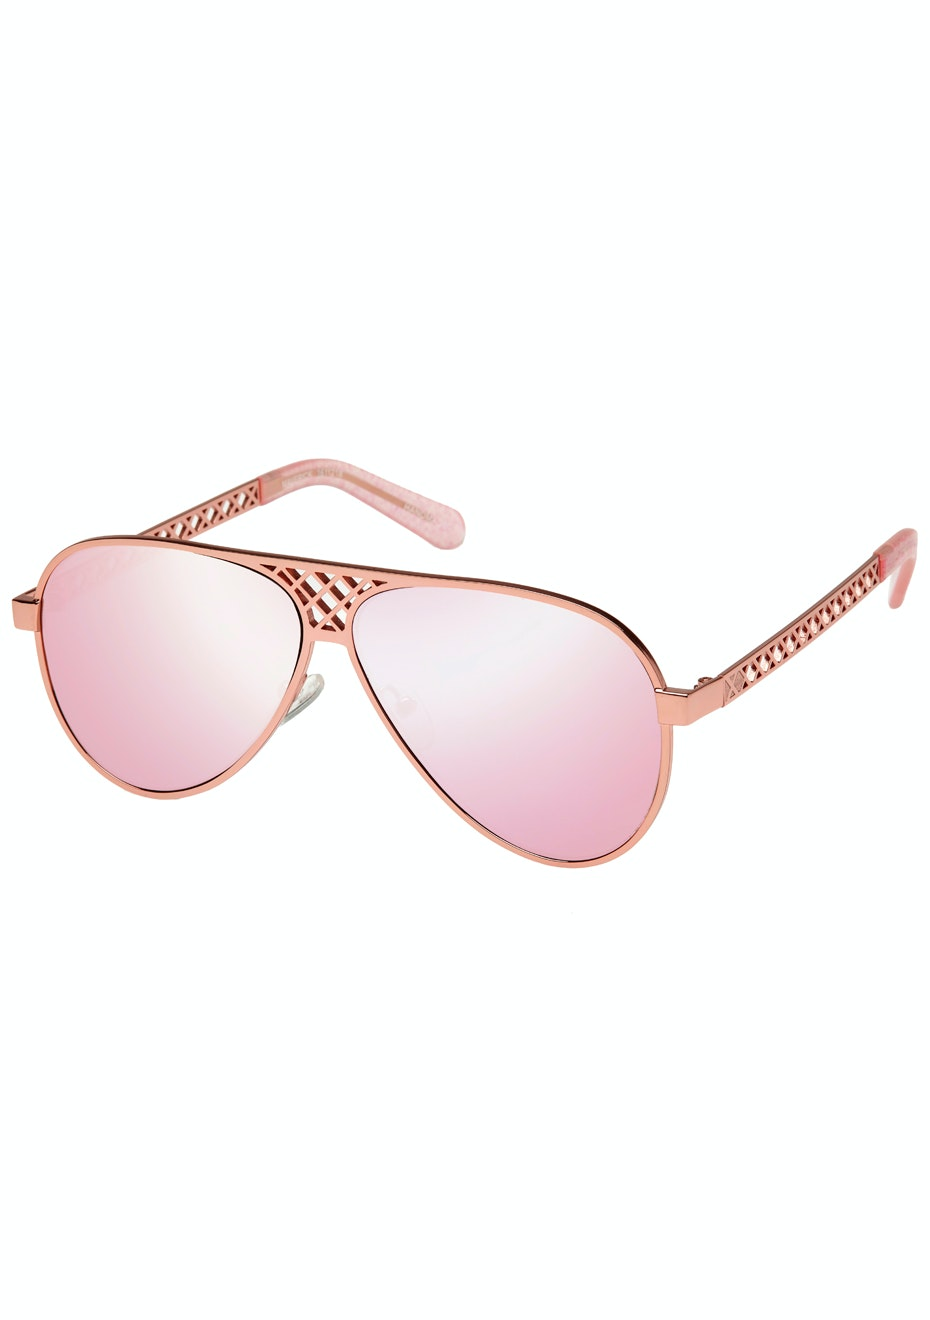 House Of Holland - Maverick 1611218 - Rose Gold / Pink Glitter